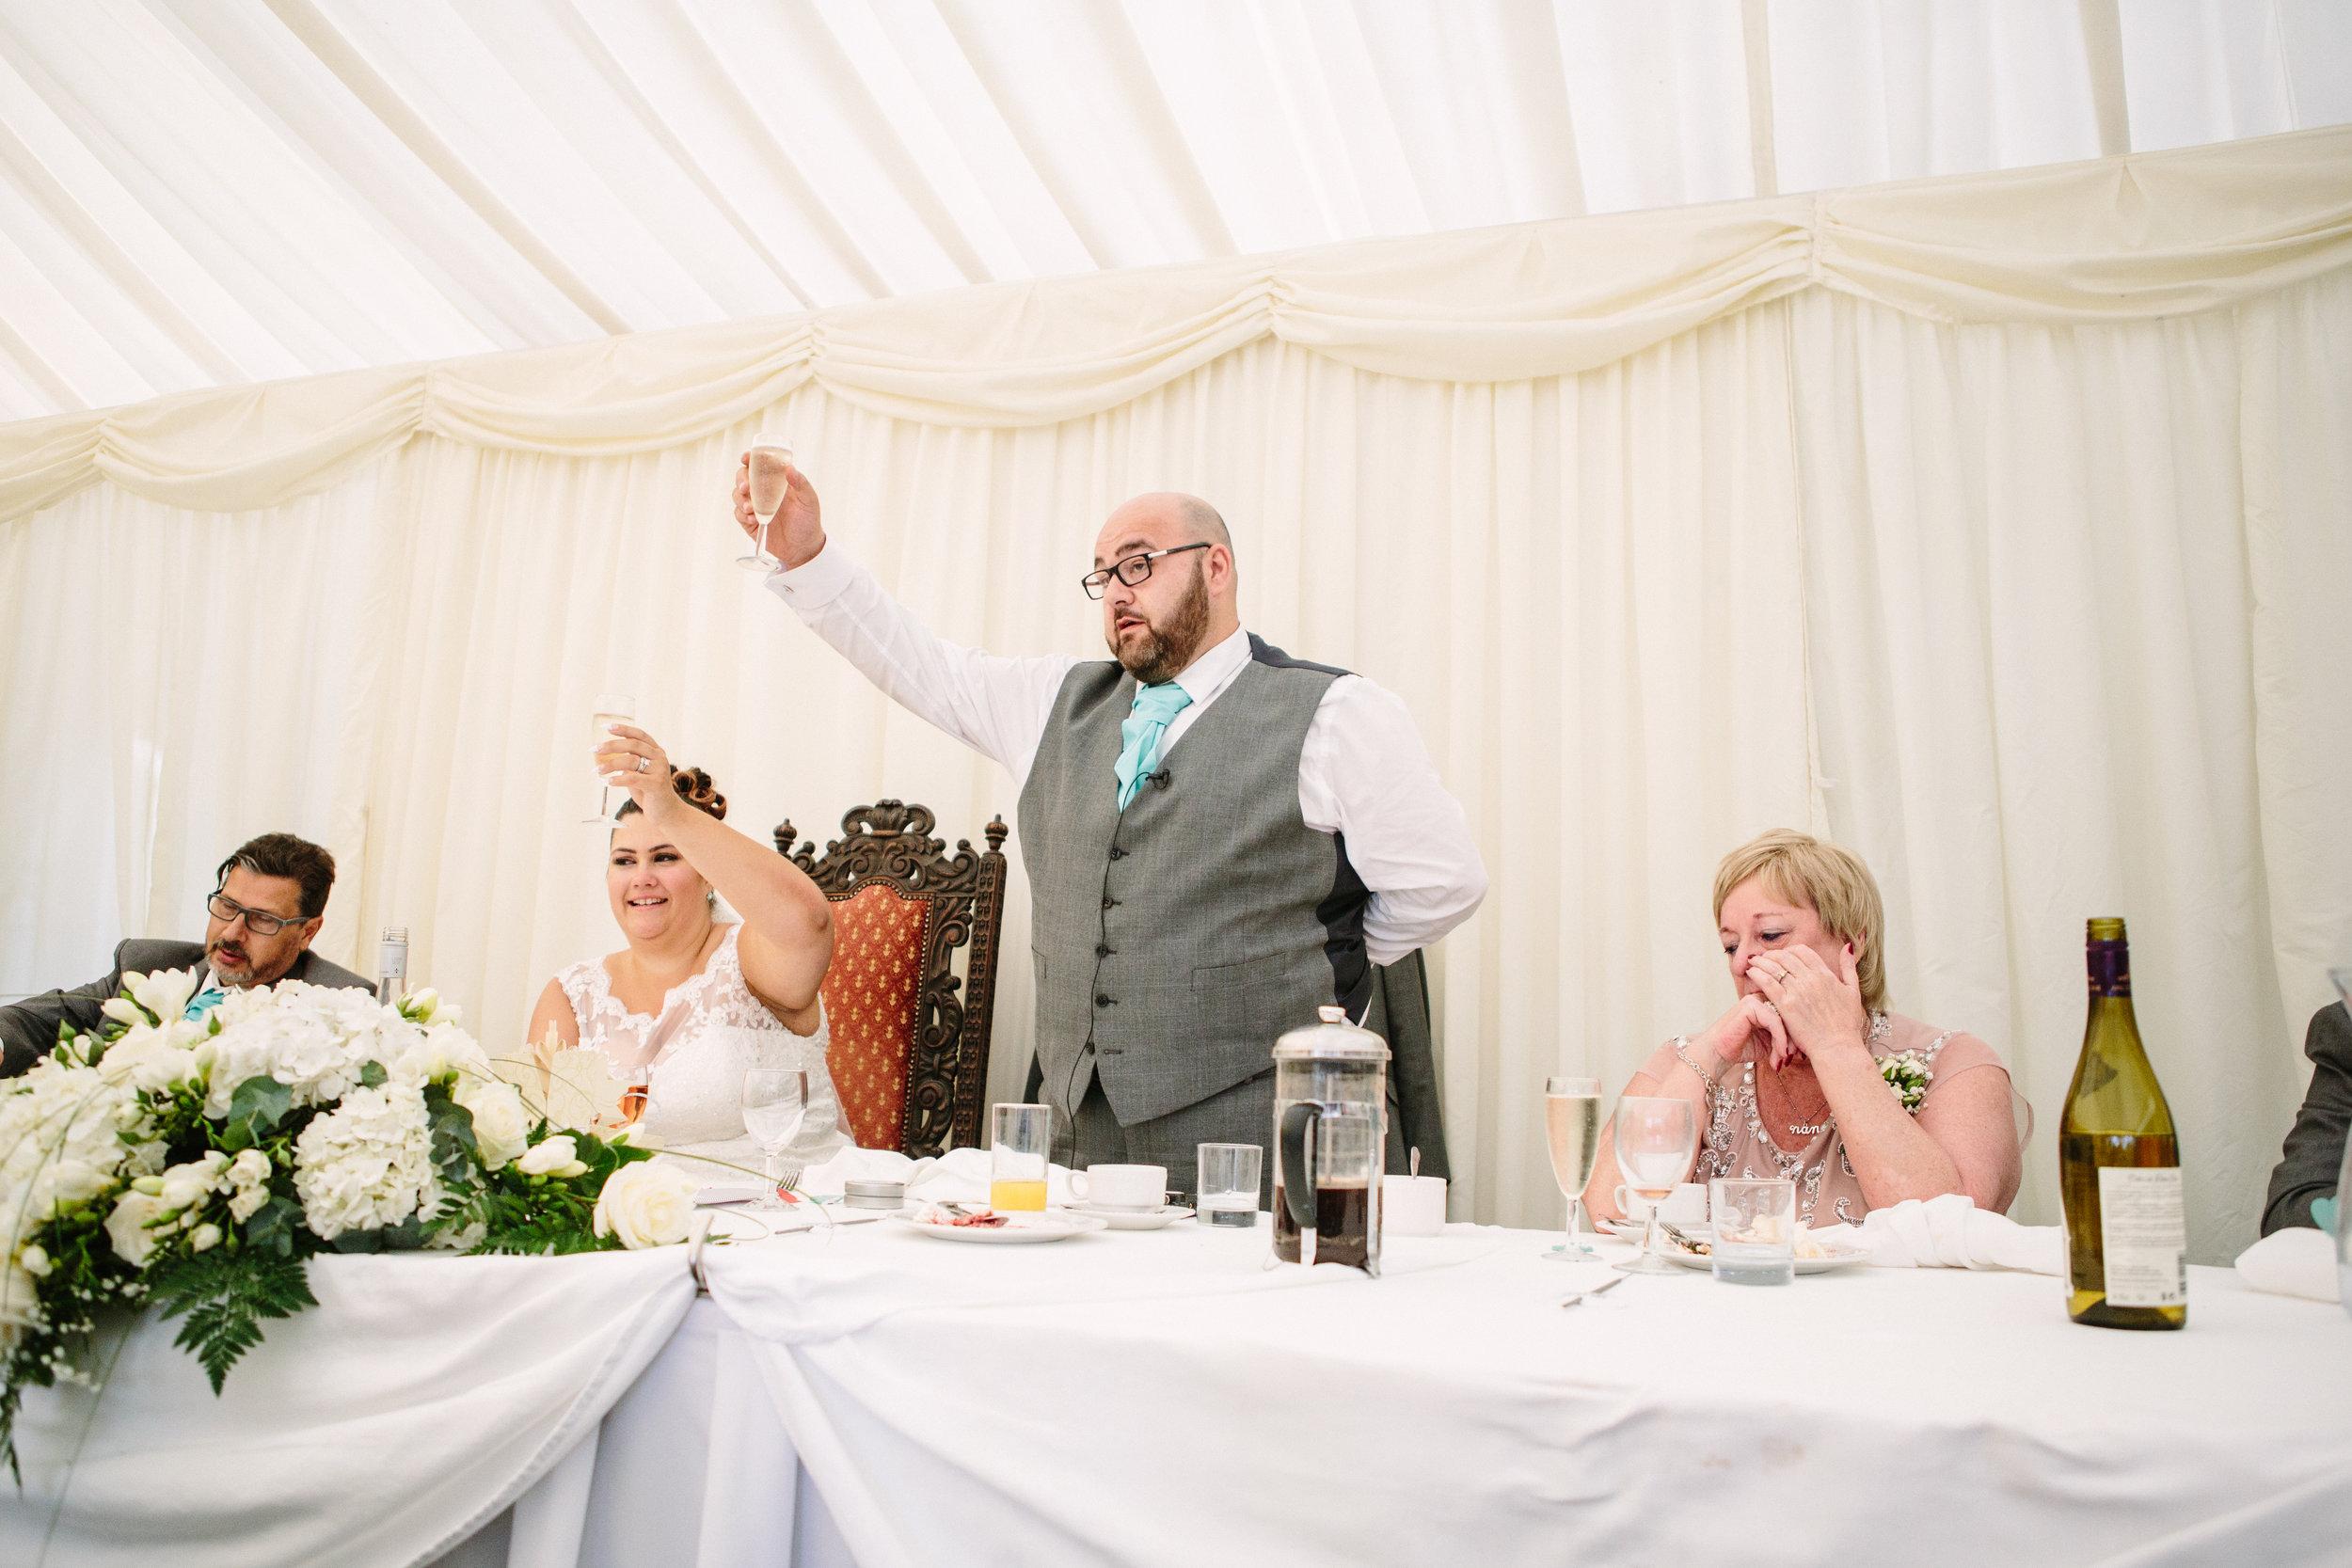 westenhangar-castle-kent-london-wedding-photography-speeches-60